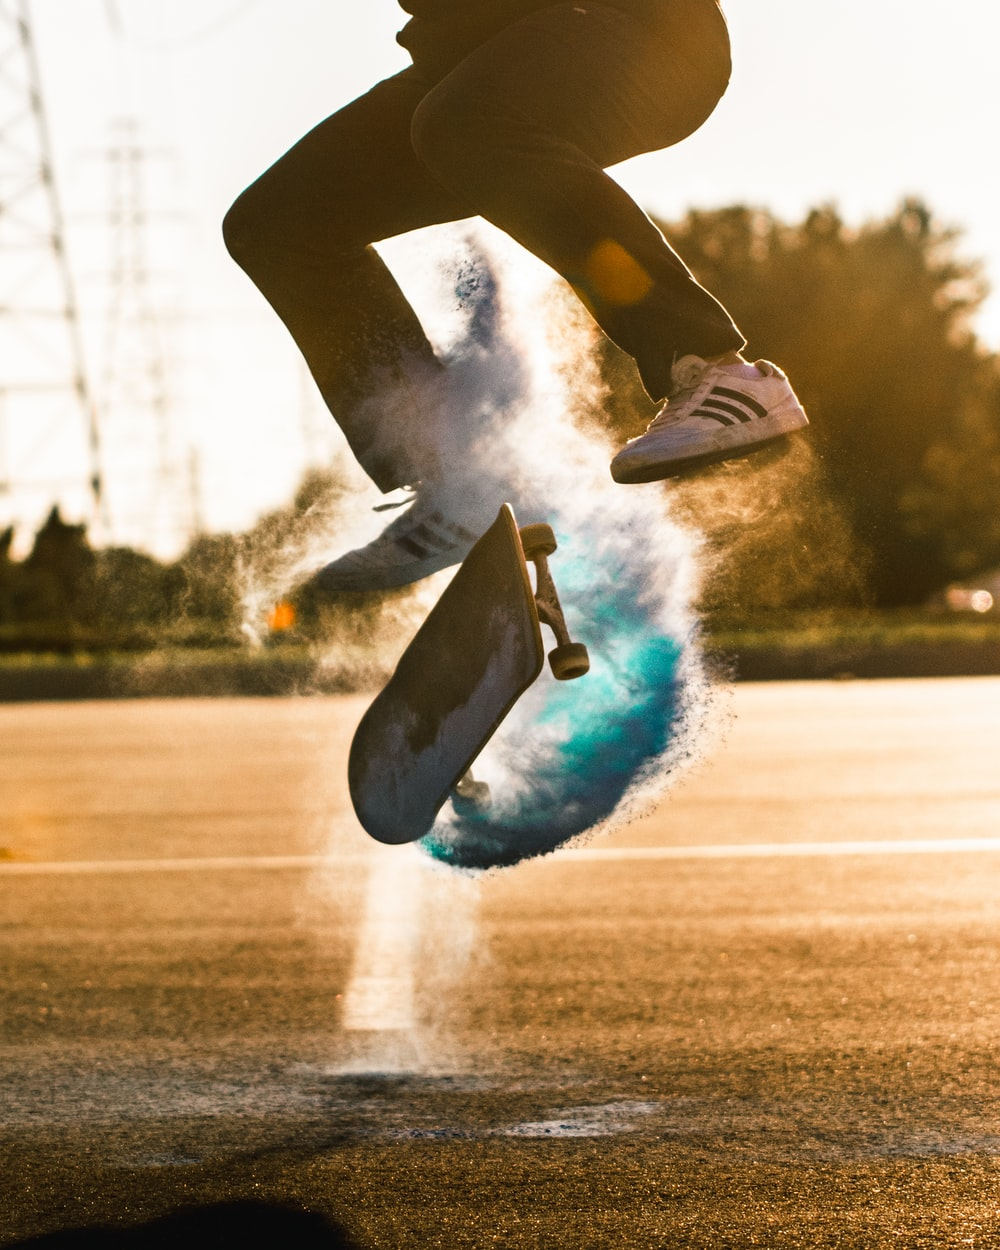 100 Skate Pictures Download Images on Unsplash 1000x1250